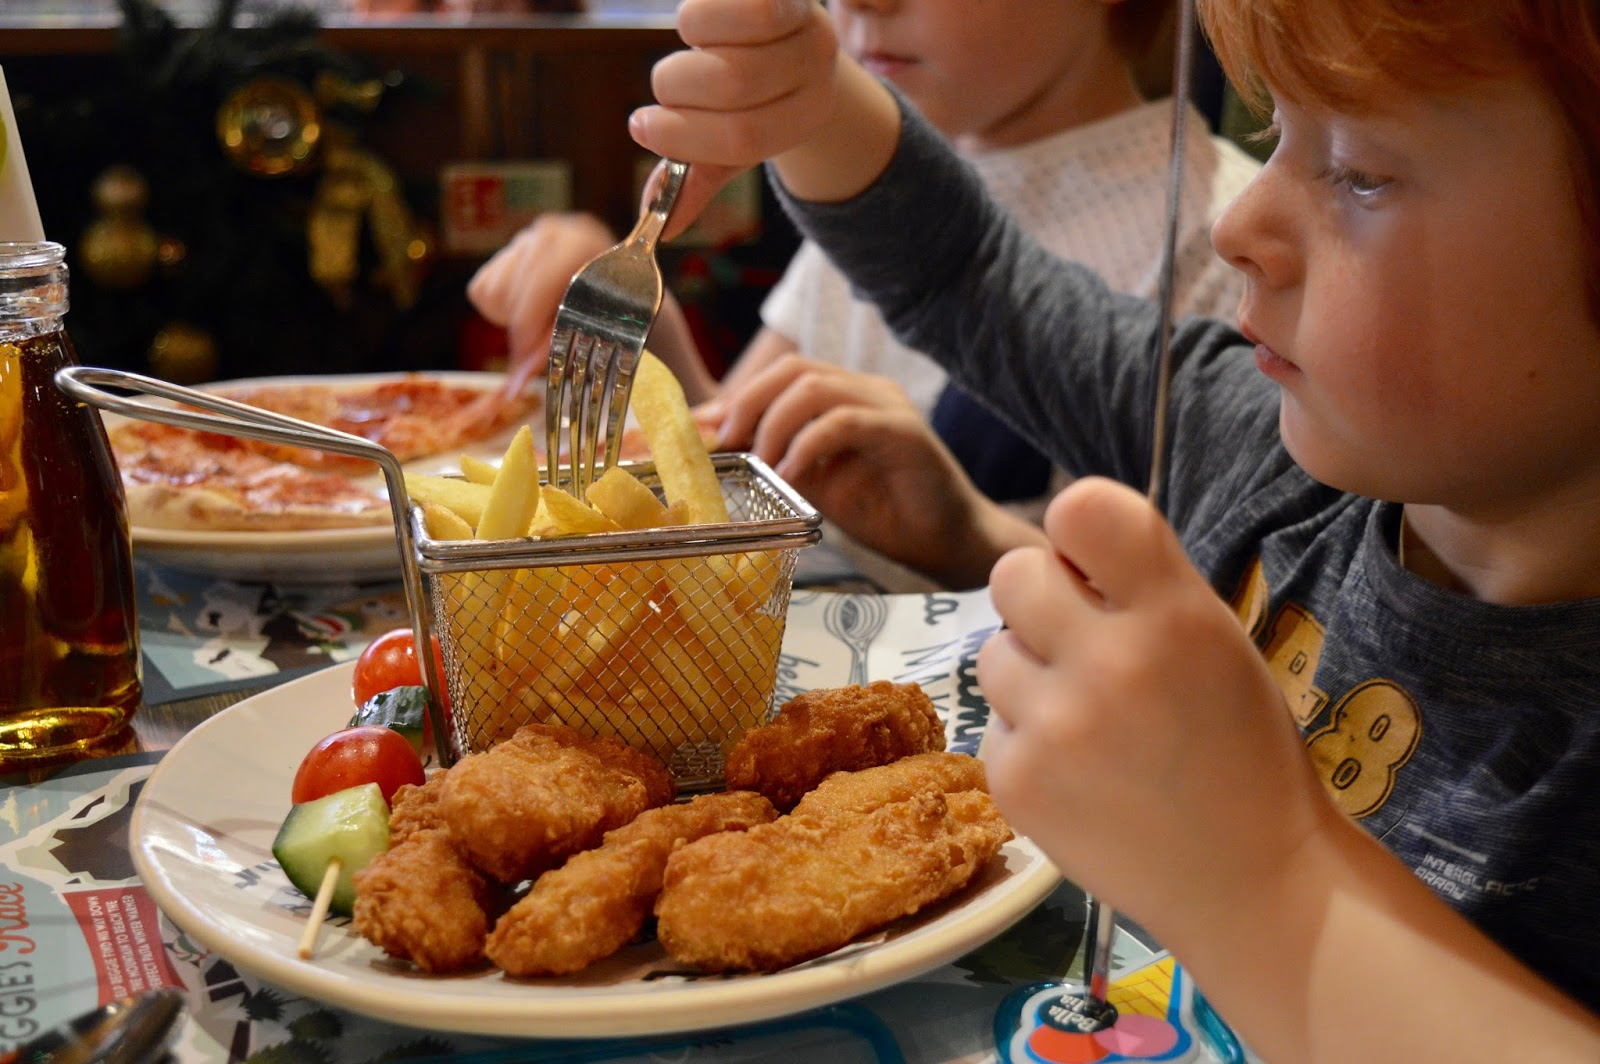 Top 10 Child Friendly Restaurants in Newcastle City Centre - Bella Italia Newcastle Kids Meal